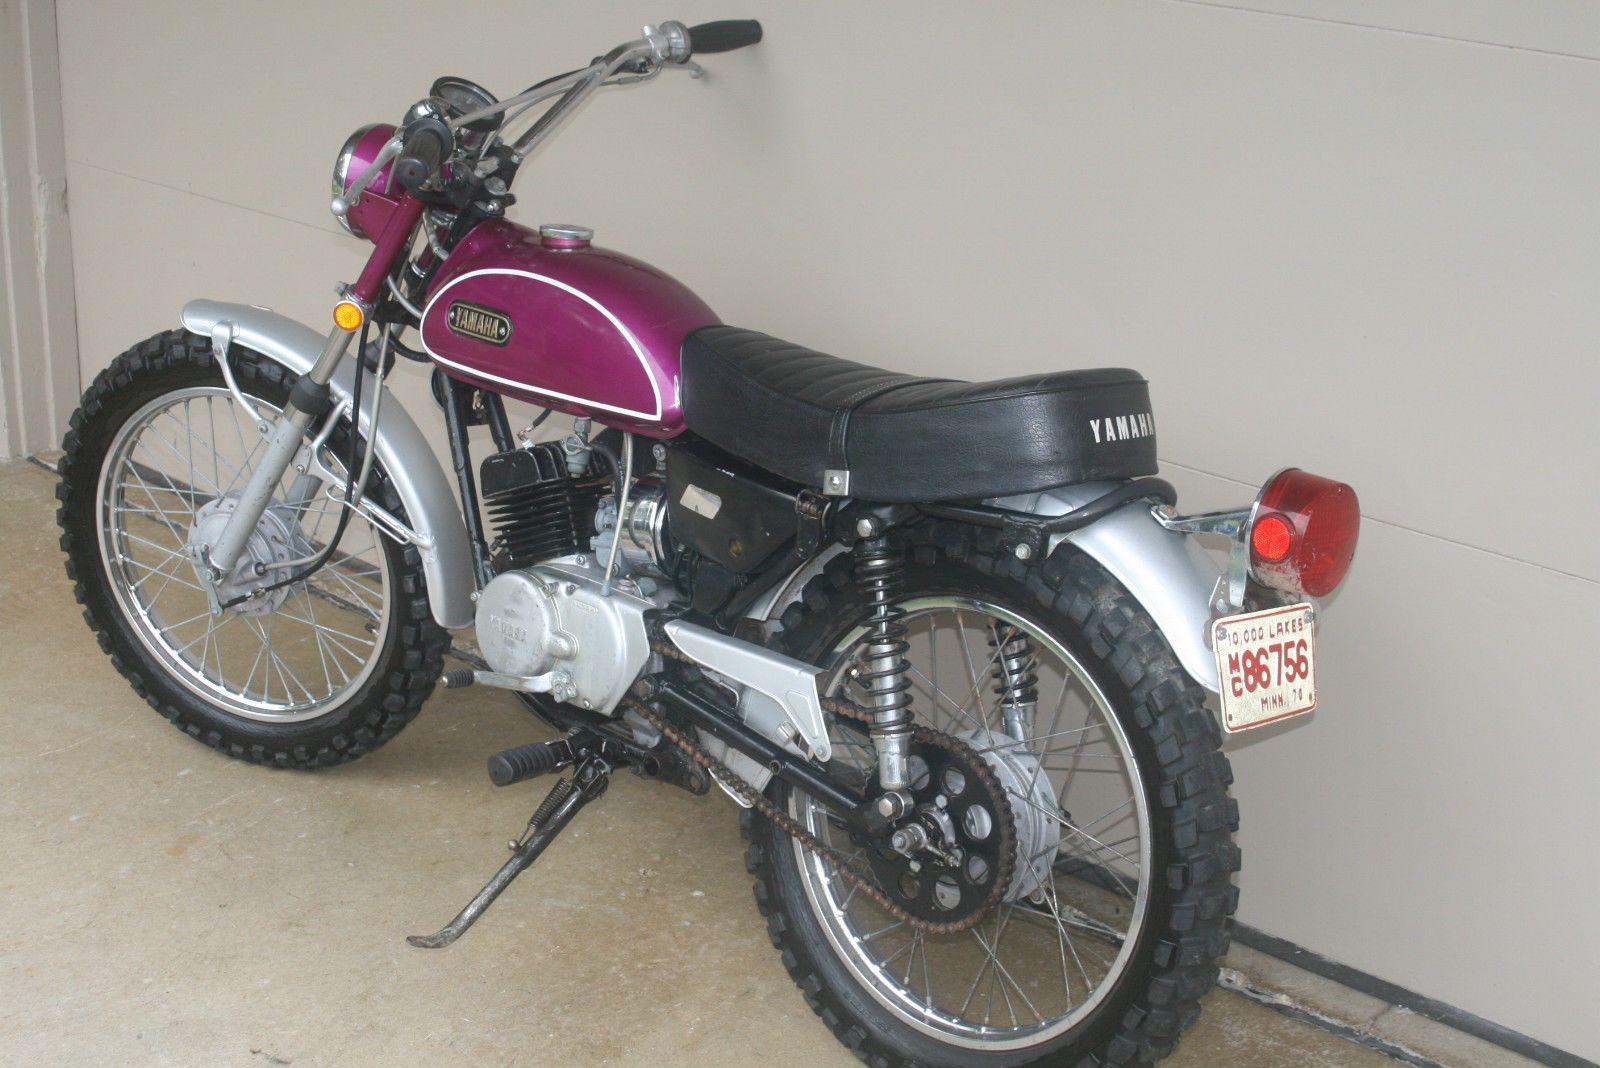 1970 Yamaha Ht1 Enduro 90 Original Vintage Time Capsule Classic Ahrma Yamaha Bikes Yamaha Vintage Bikes